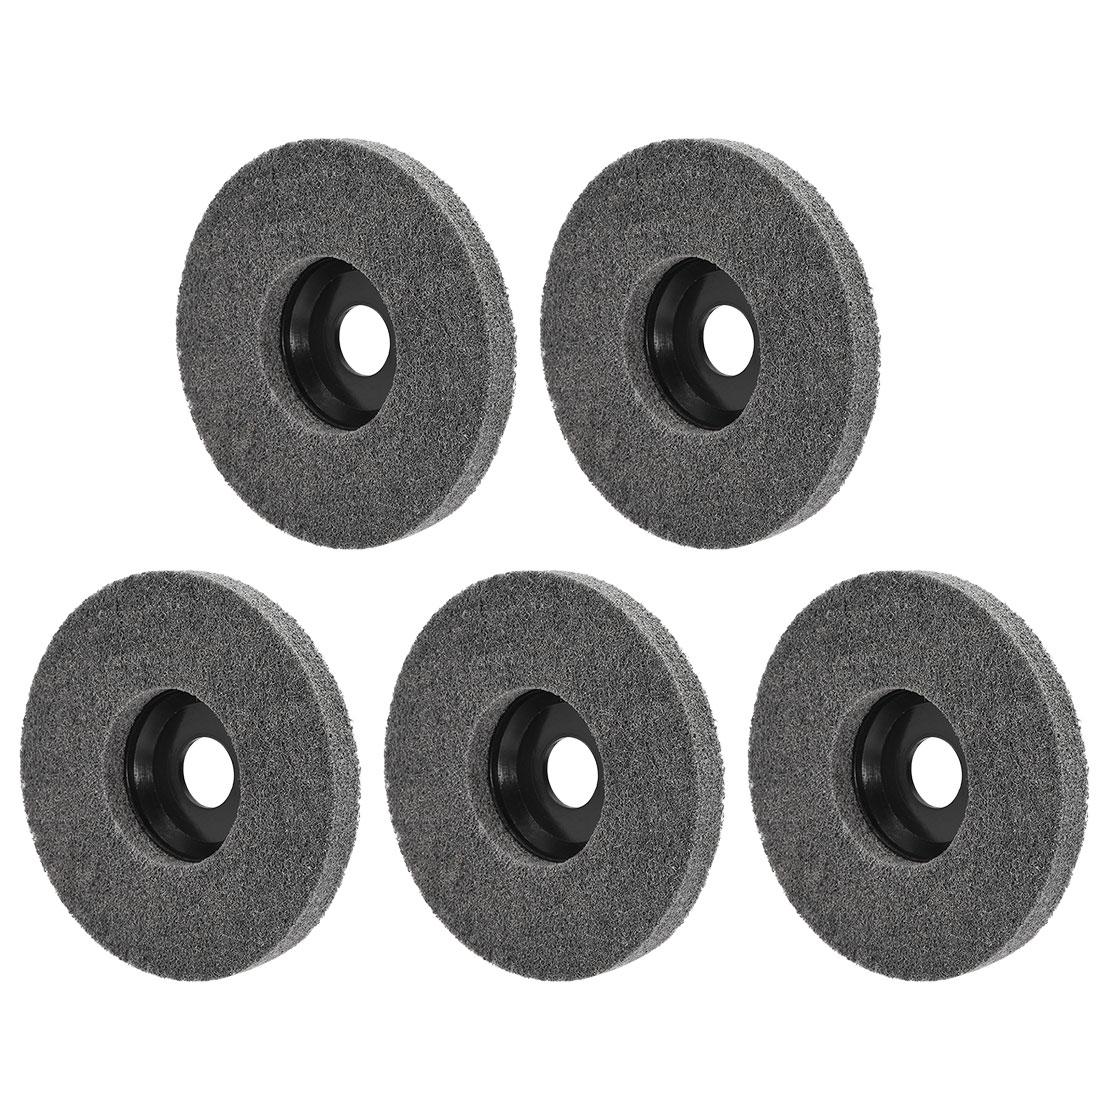 5 Inch Polishing Wheel Buffing Pad Felt Disc for 100 Angle Grinders Black 5pcs